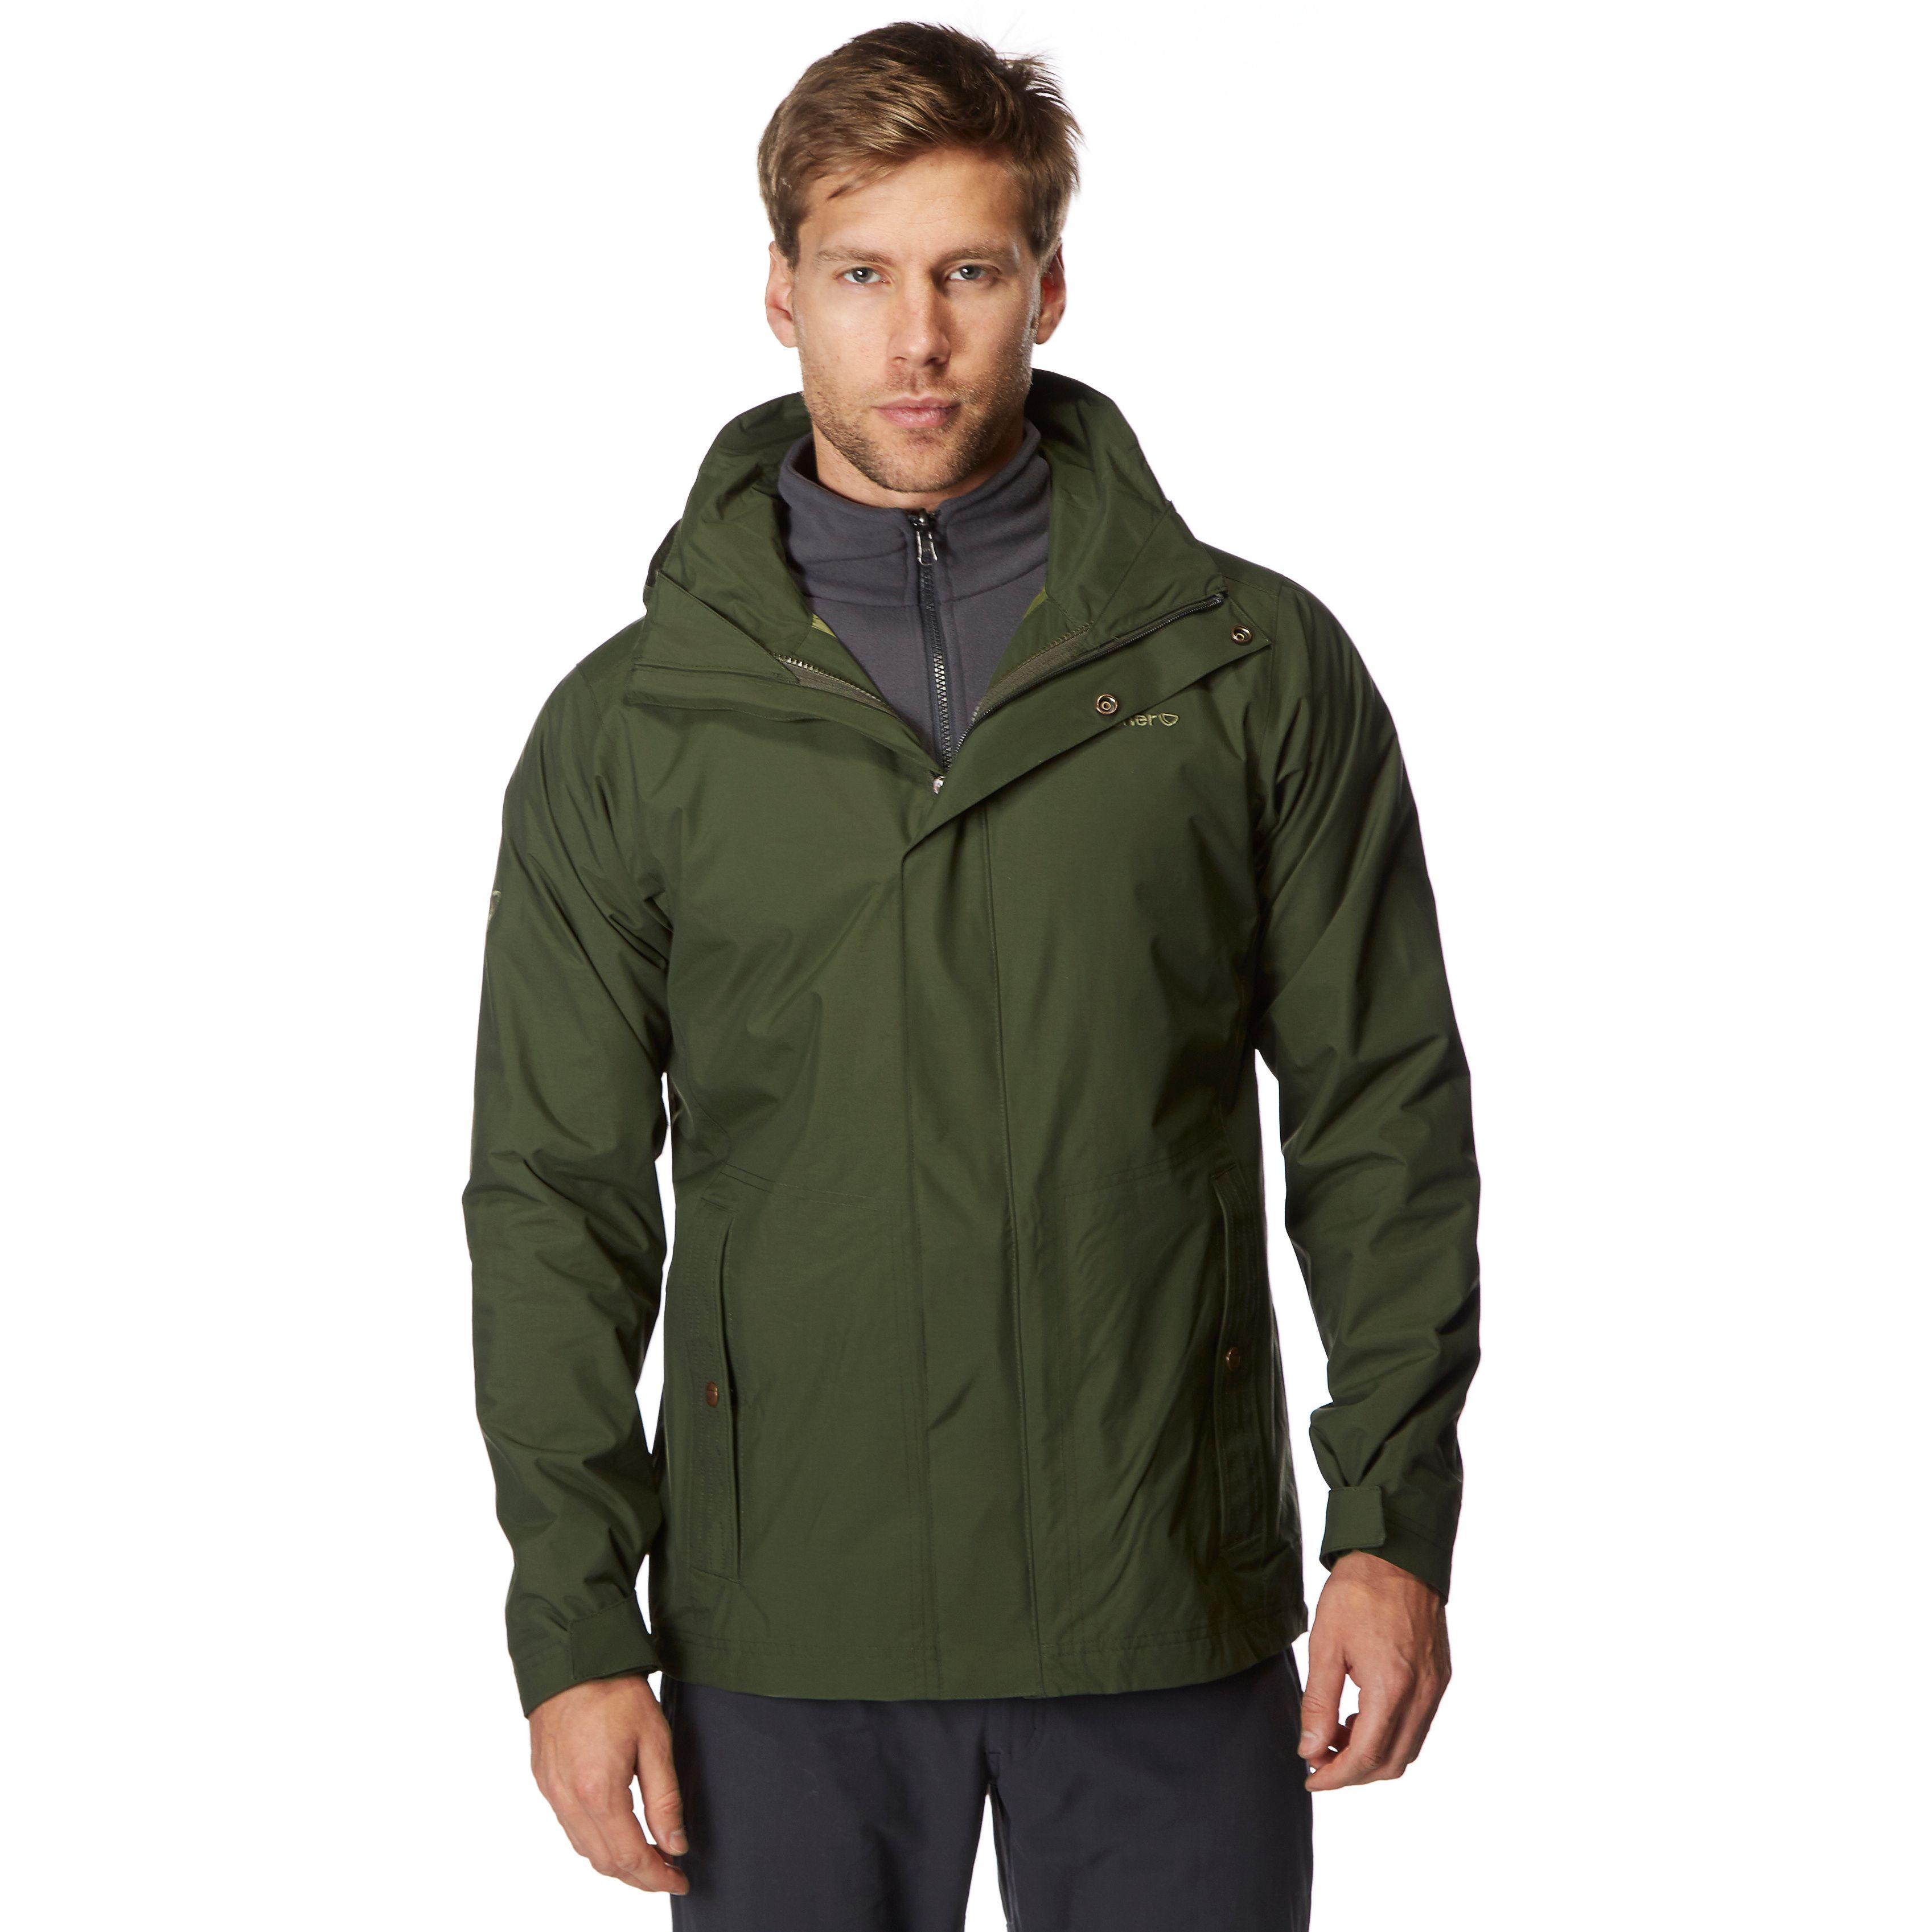 BRASHER Men's 3 in 1 Windermere Jacket